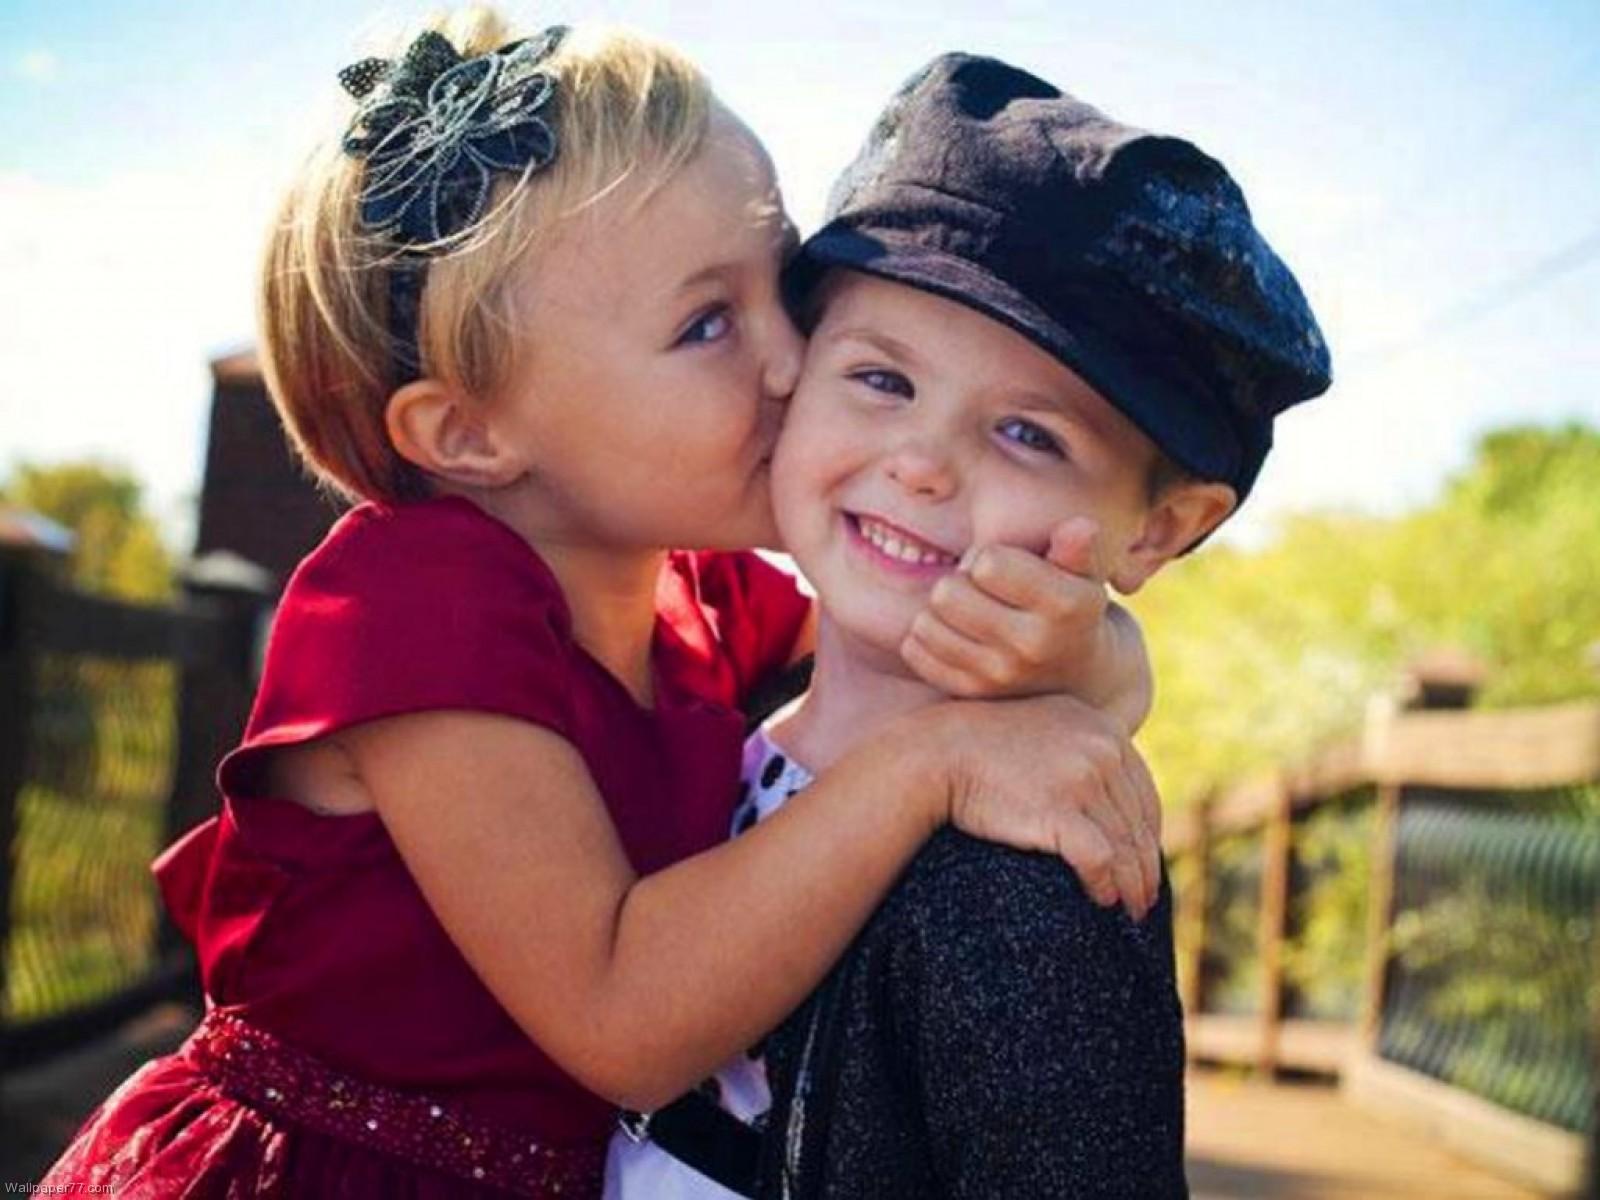 Good Hd Widescreen Photos Of Cute Kiss Full Hd 1080p 441181